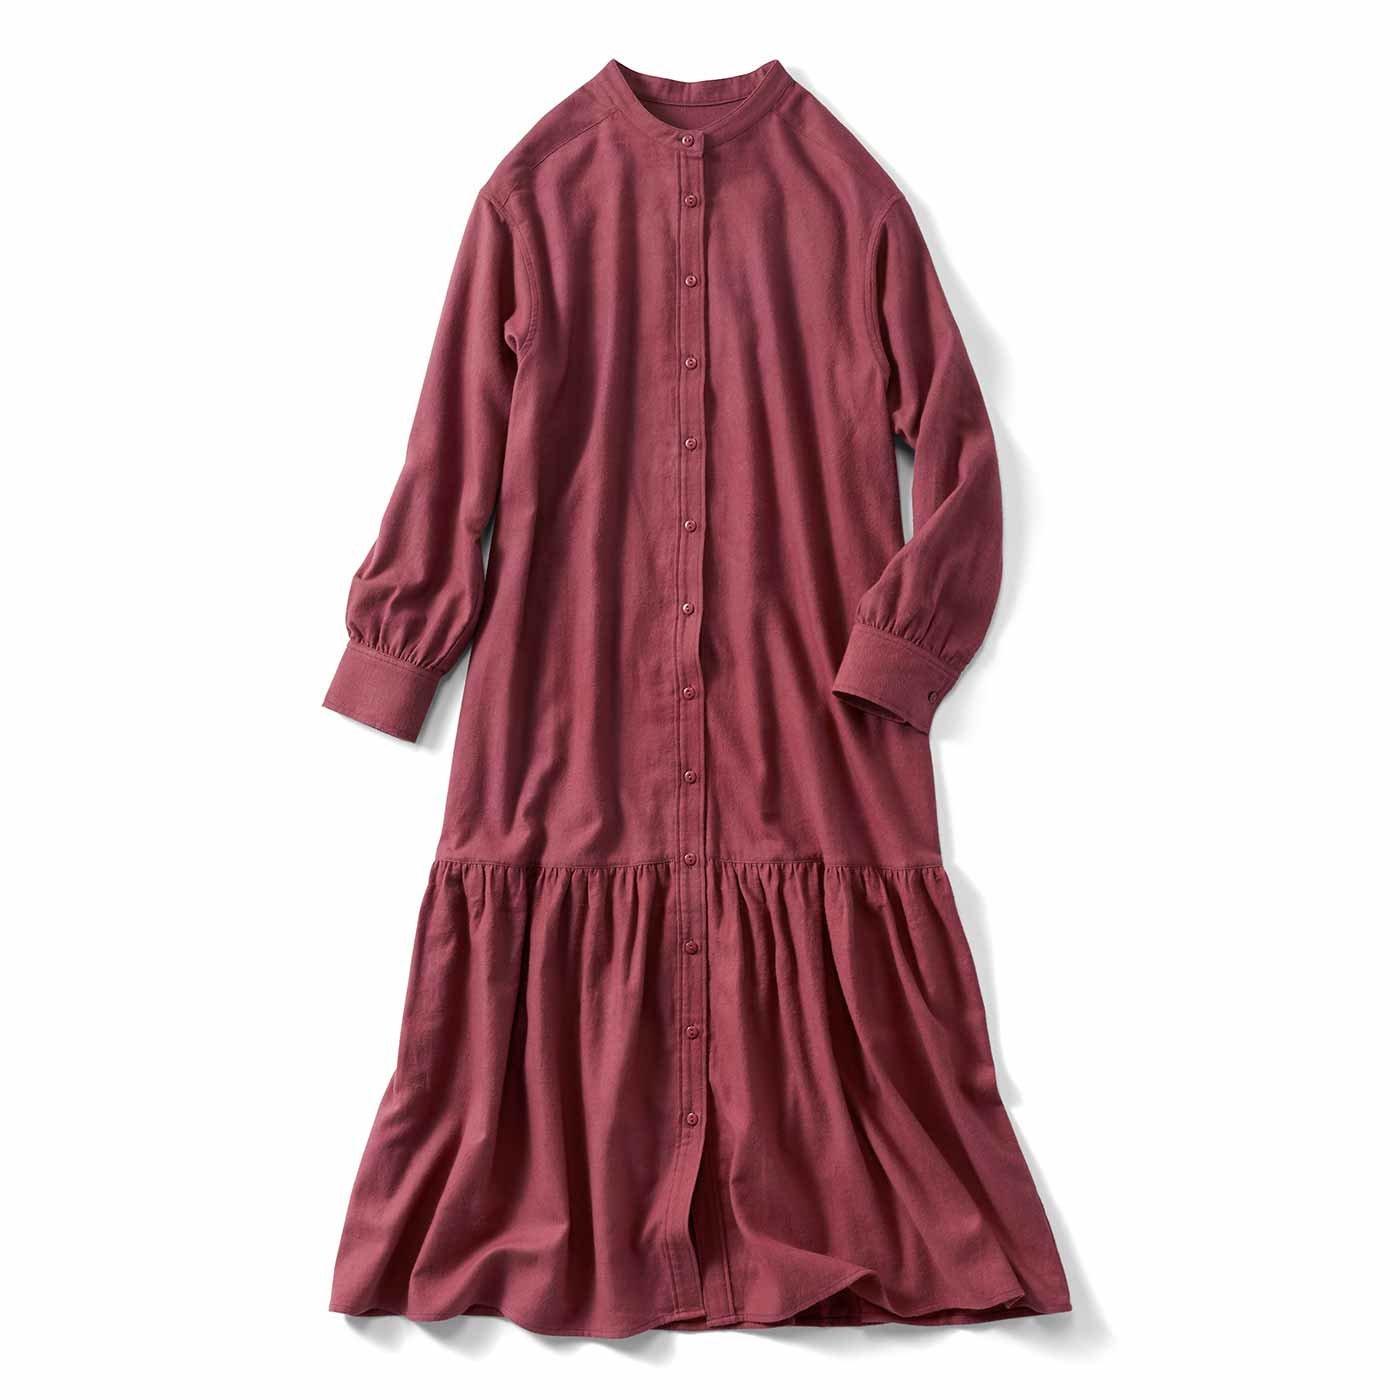 IEDIT[イディット] 夜明けの空のシャツワンピース〈バーガンディーレッド〉